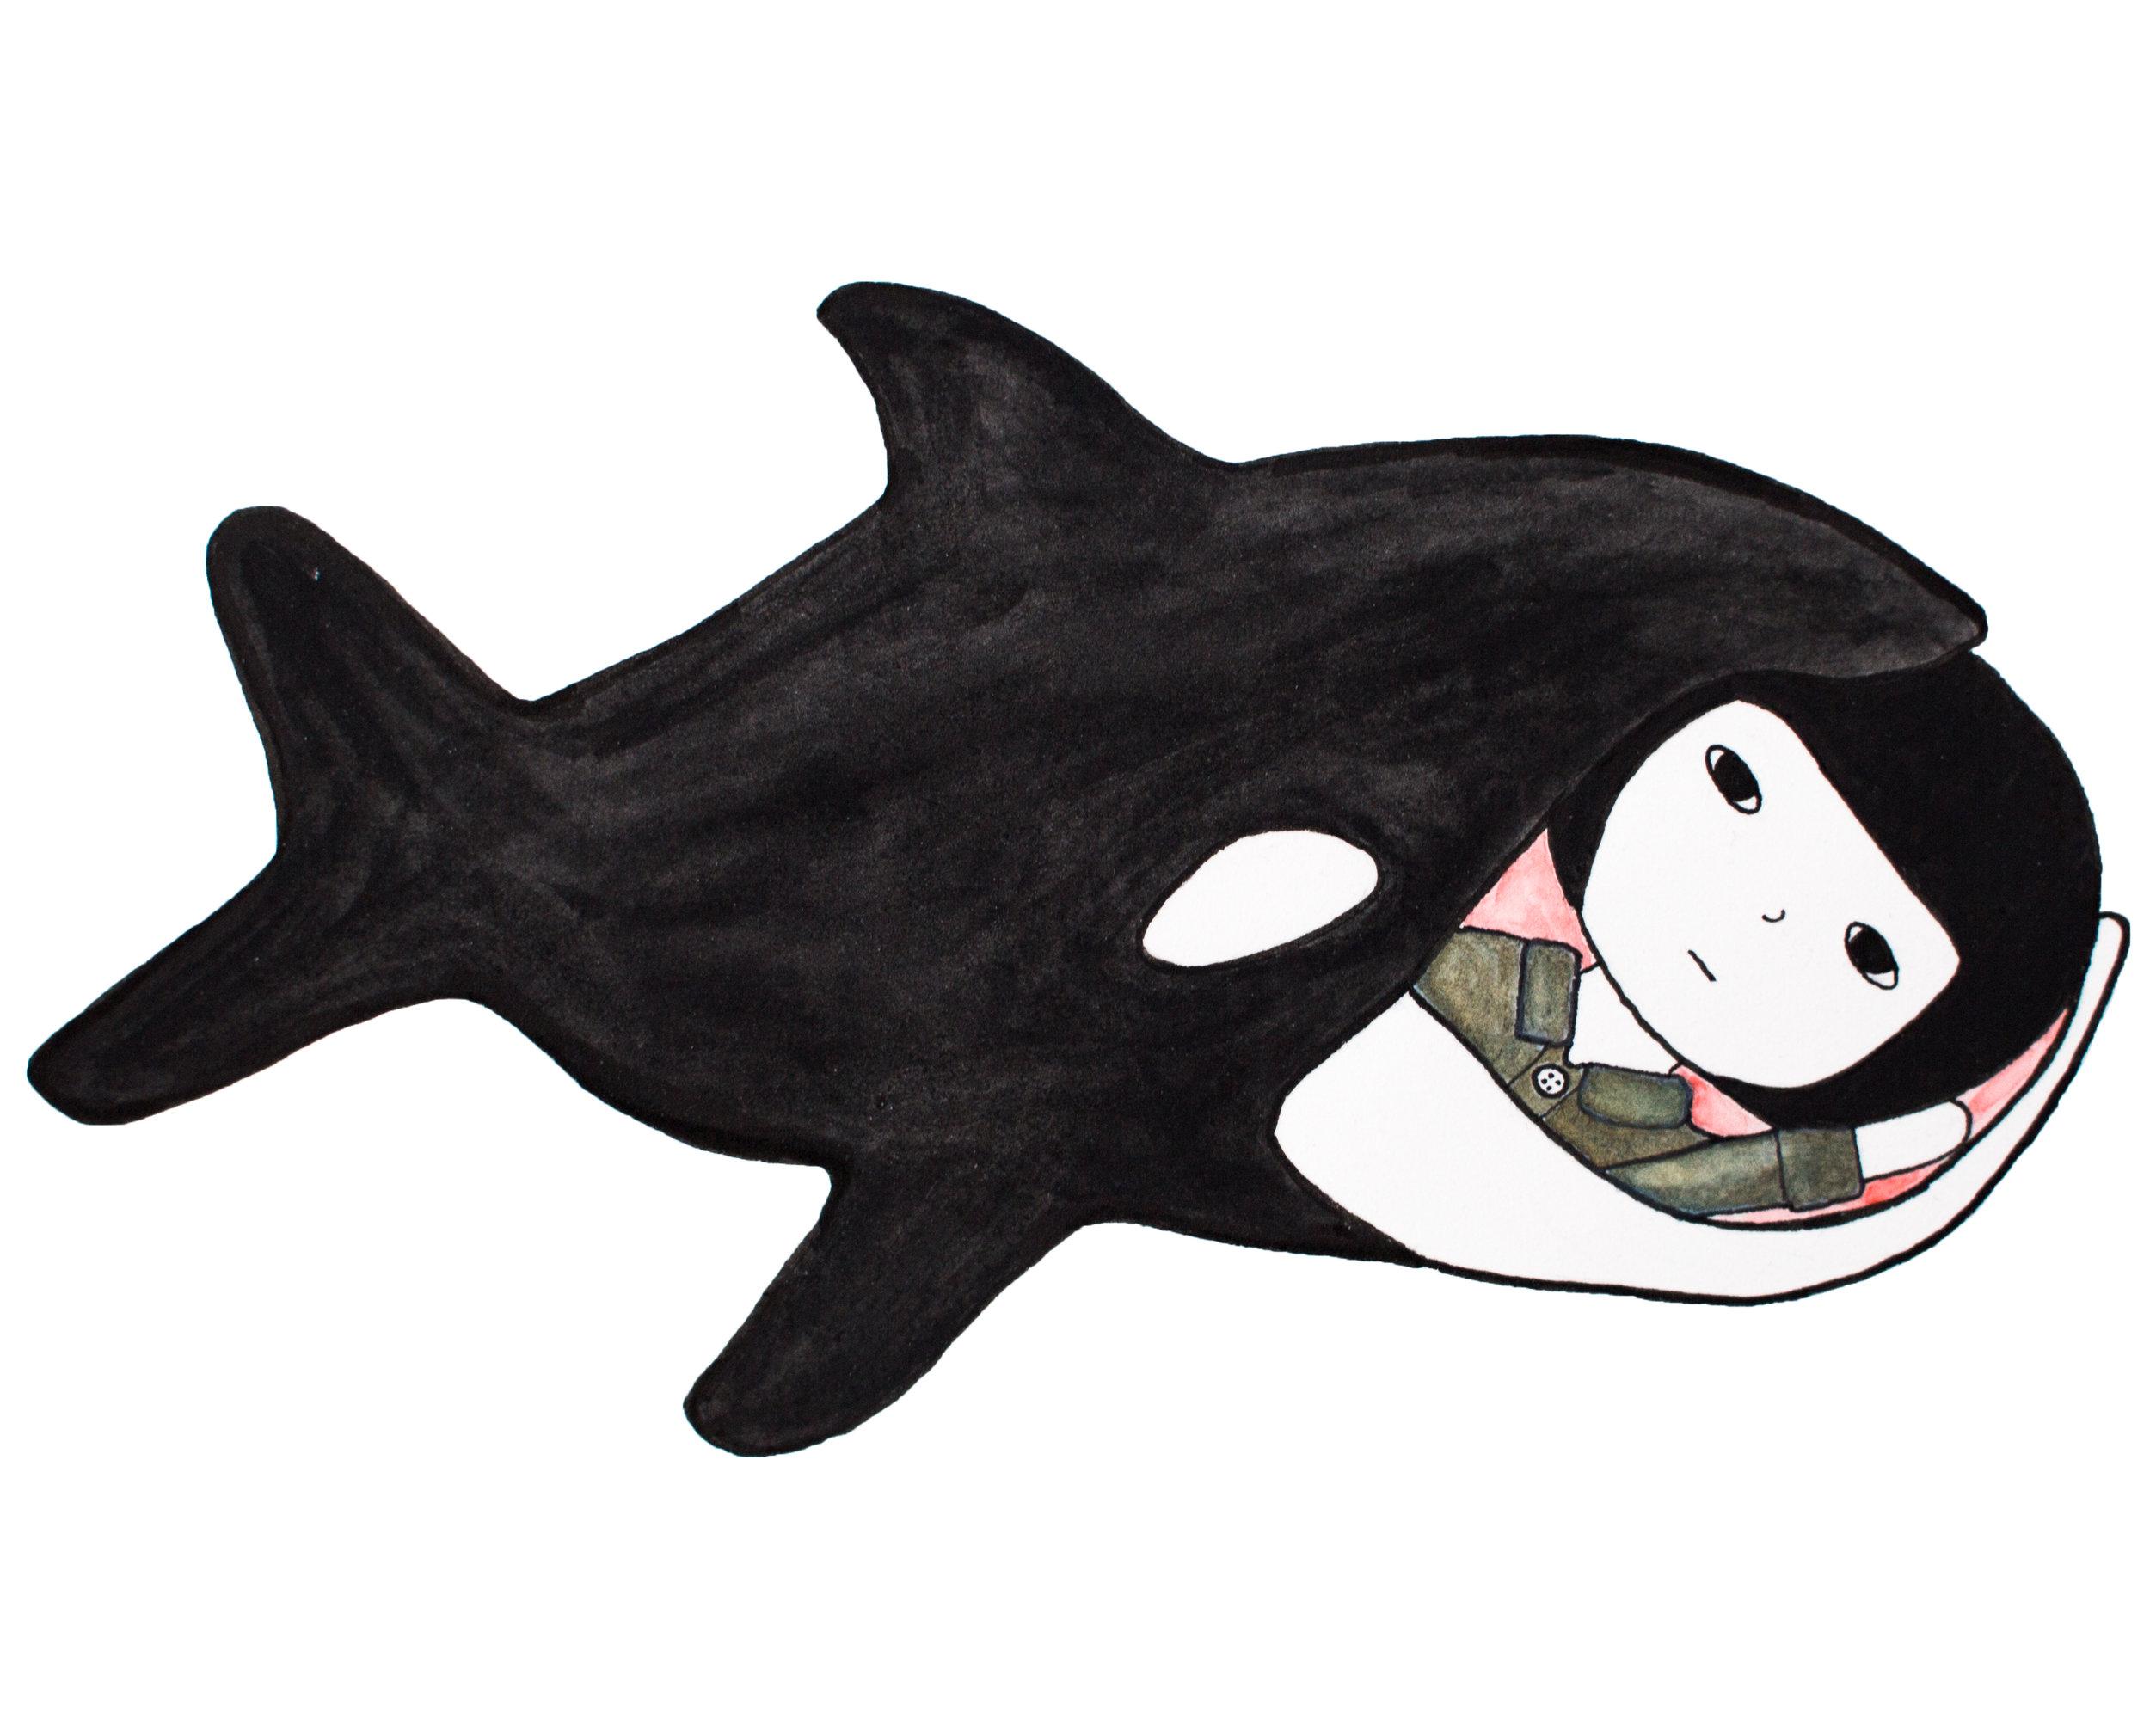 whalegirl_master_allwhite_13x10.5_web.jpg